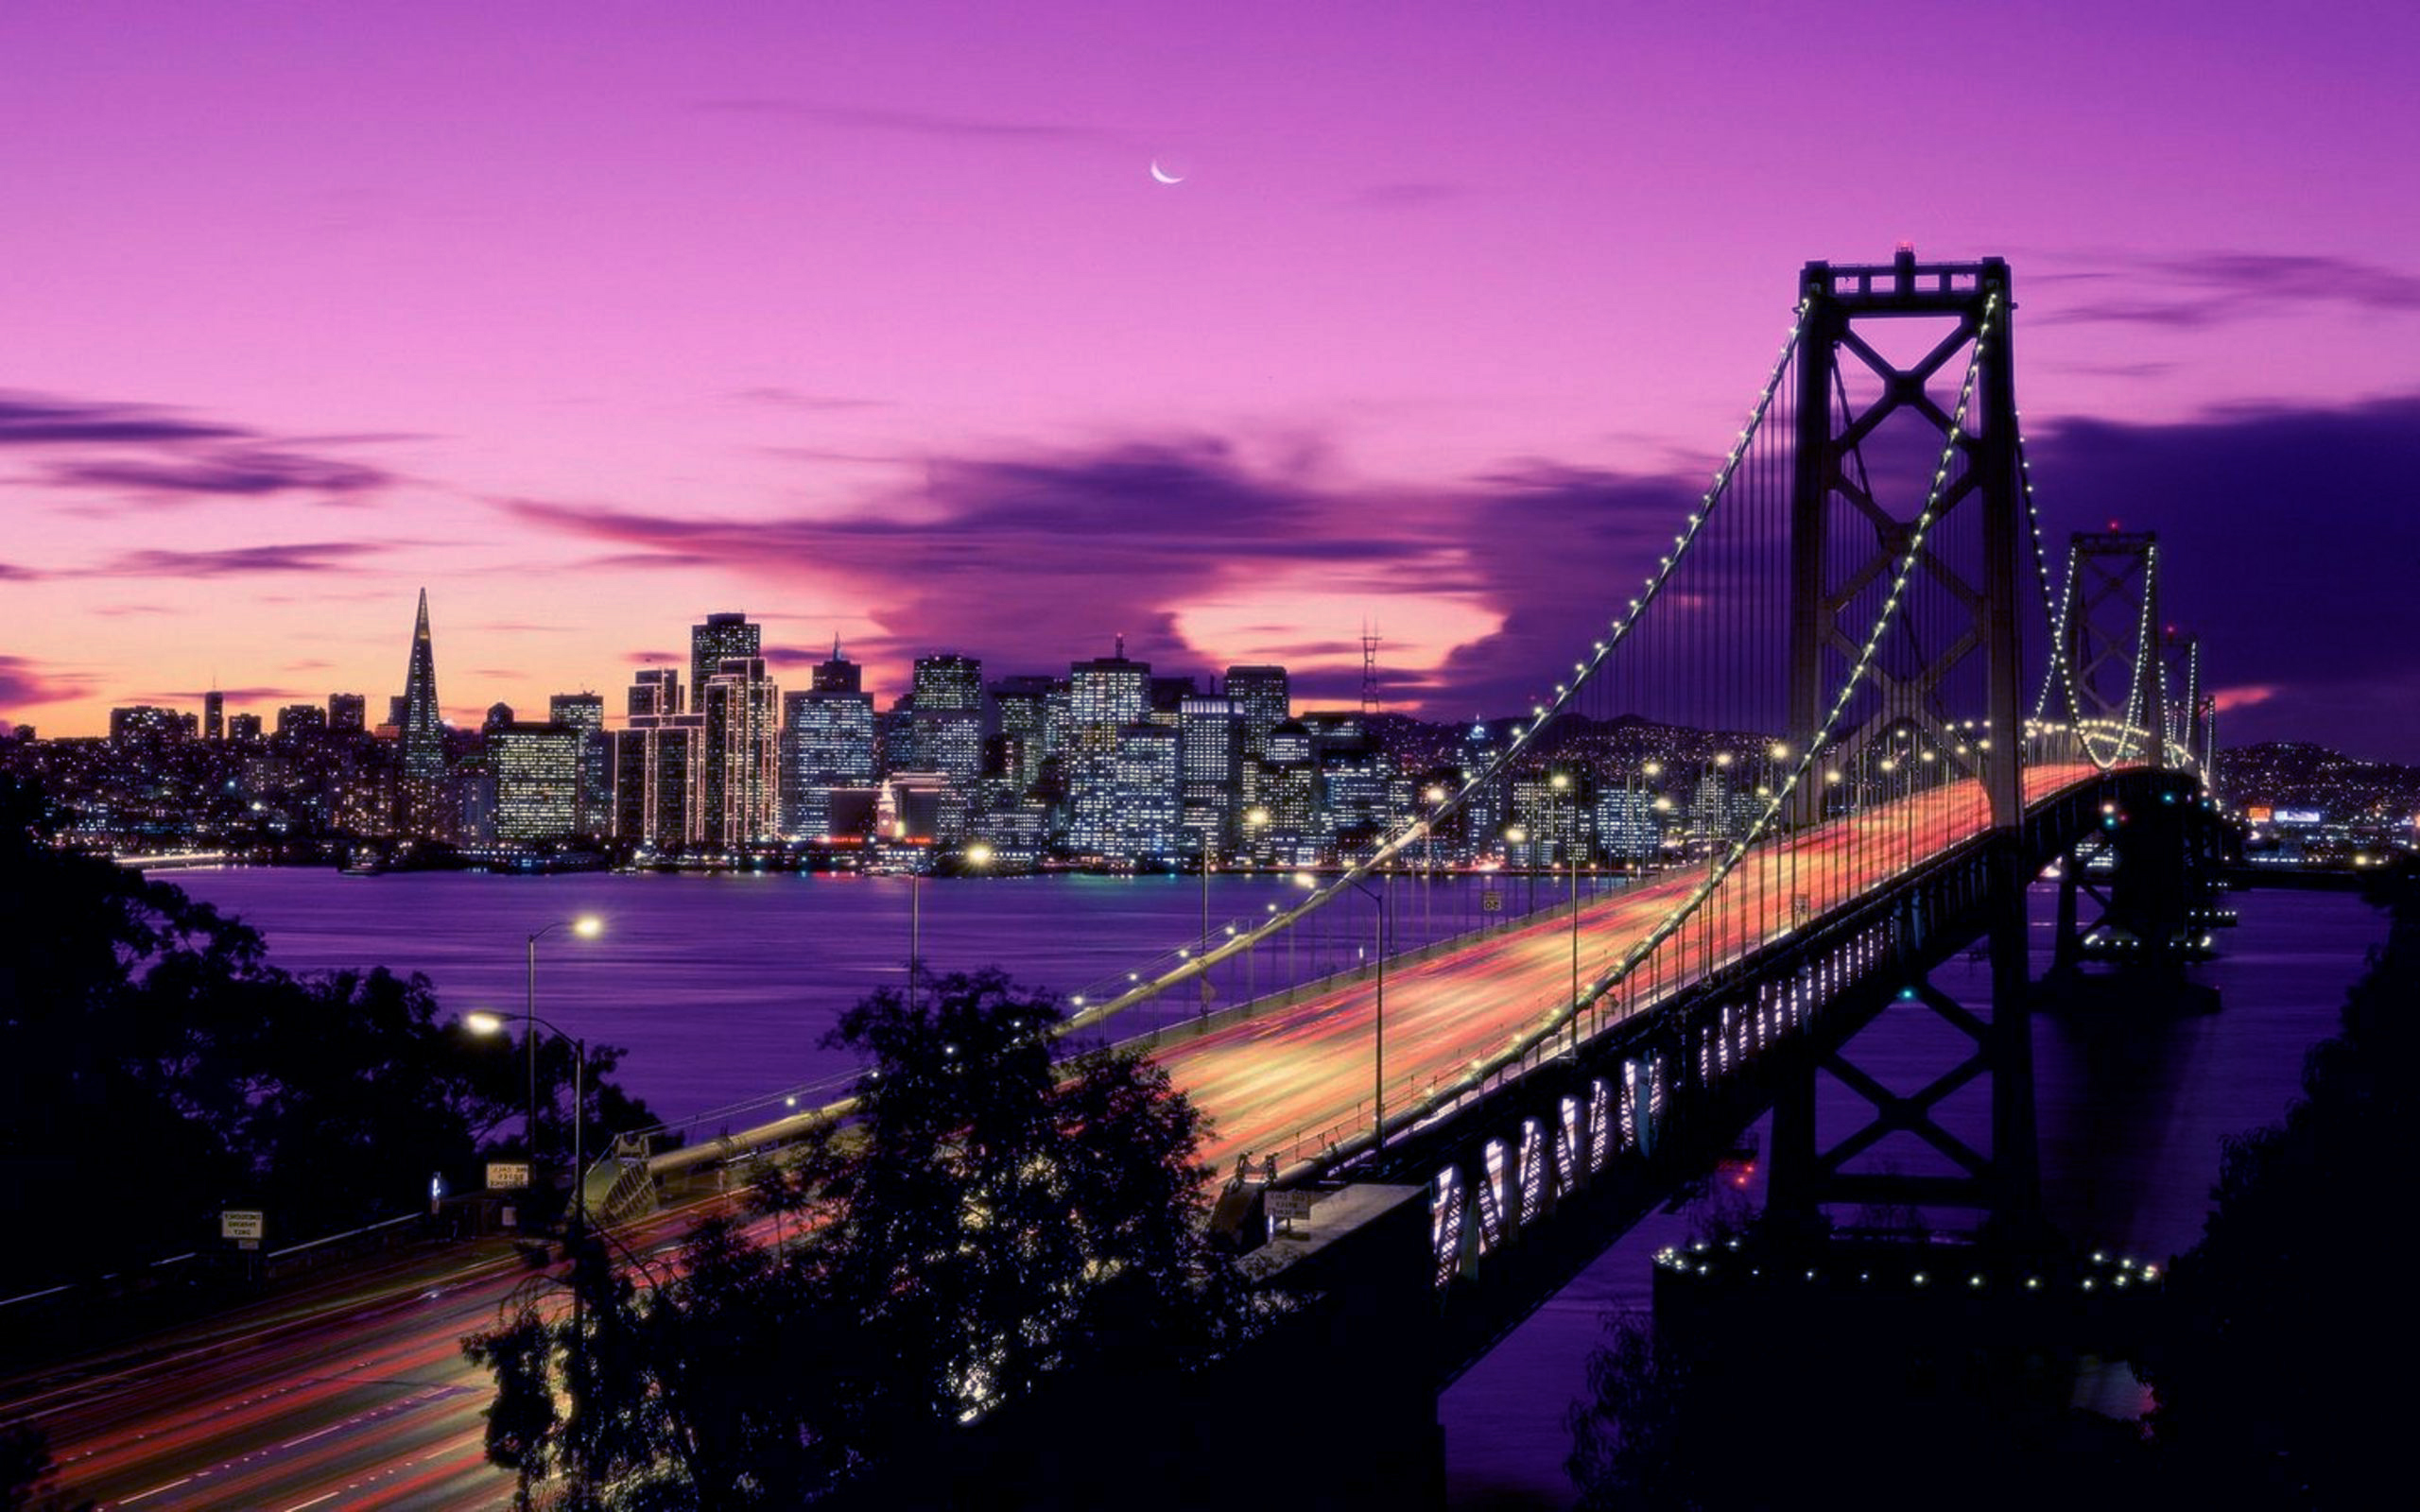 California Background 2560x1600